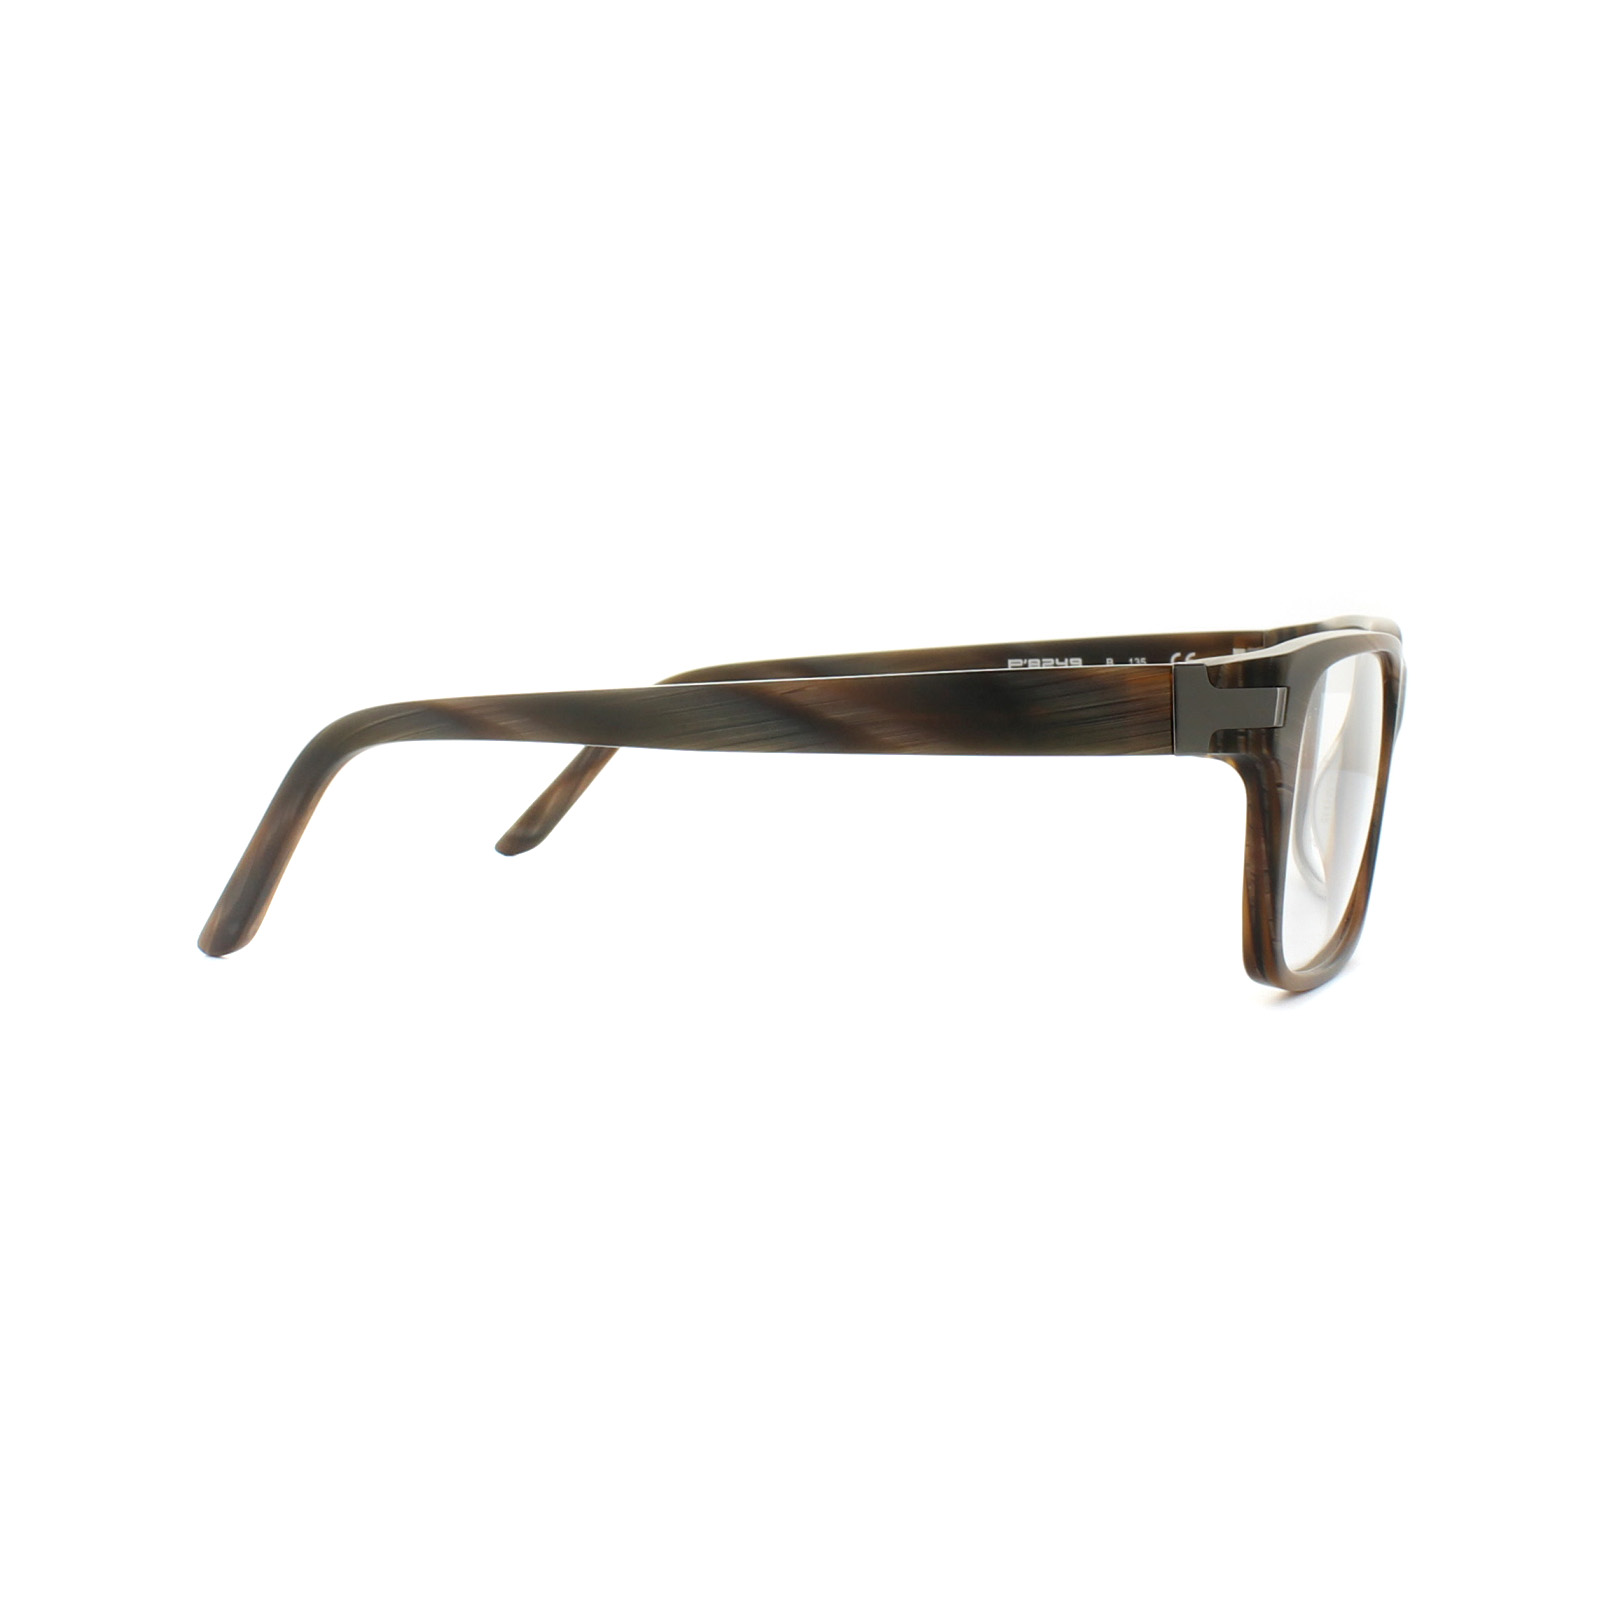 794ebdc269c9 Sentinel Porsche Design Glasses Frames P8249 B Chocolate Structured